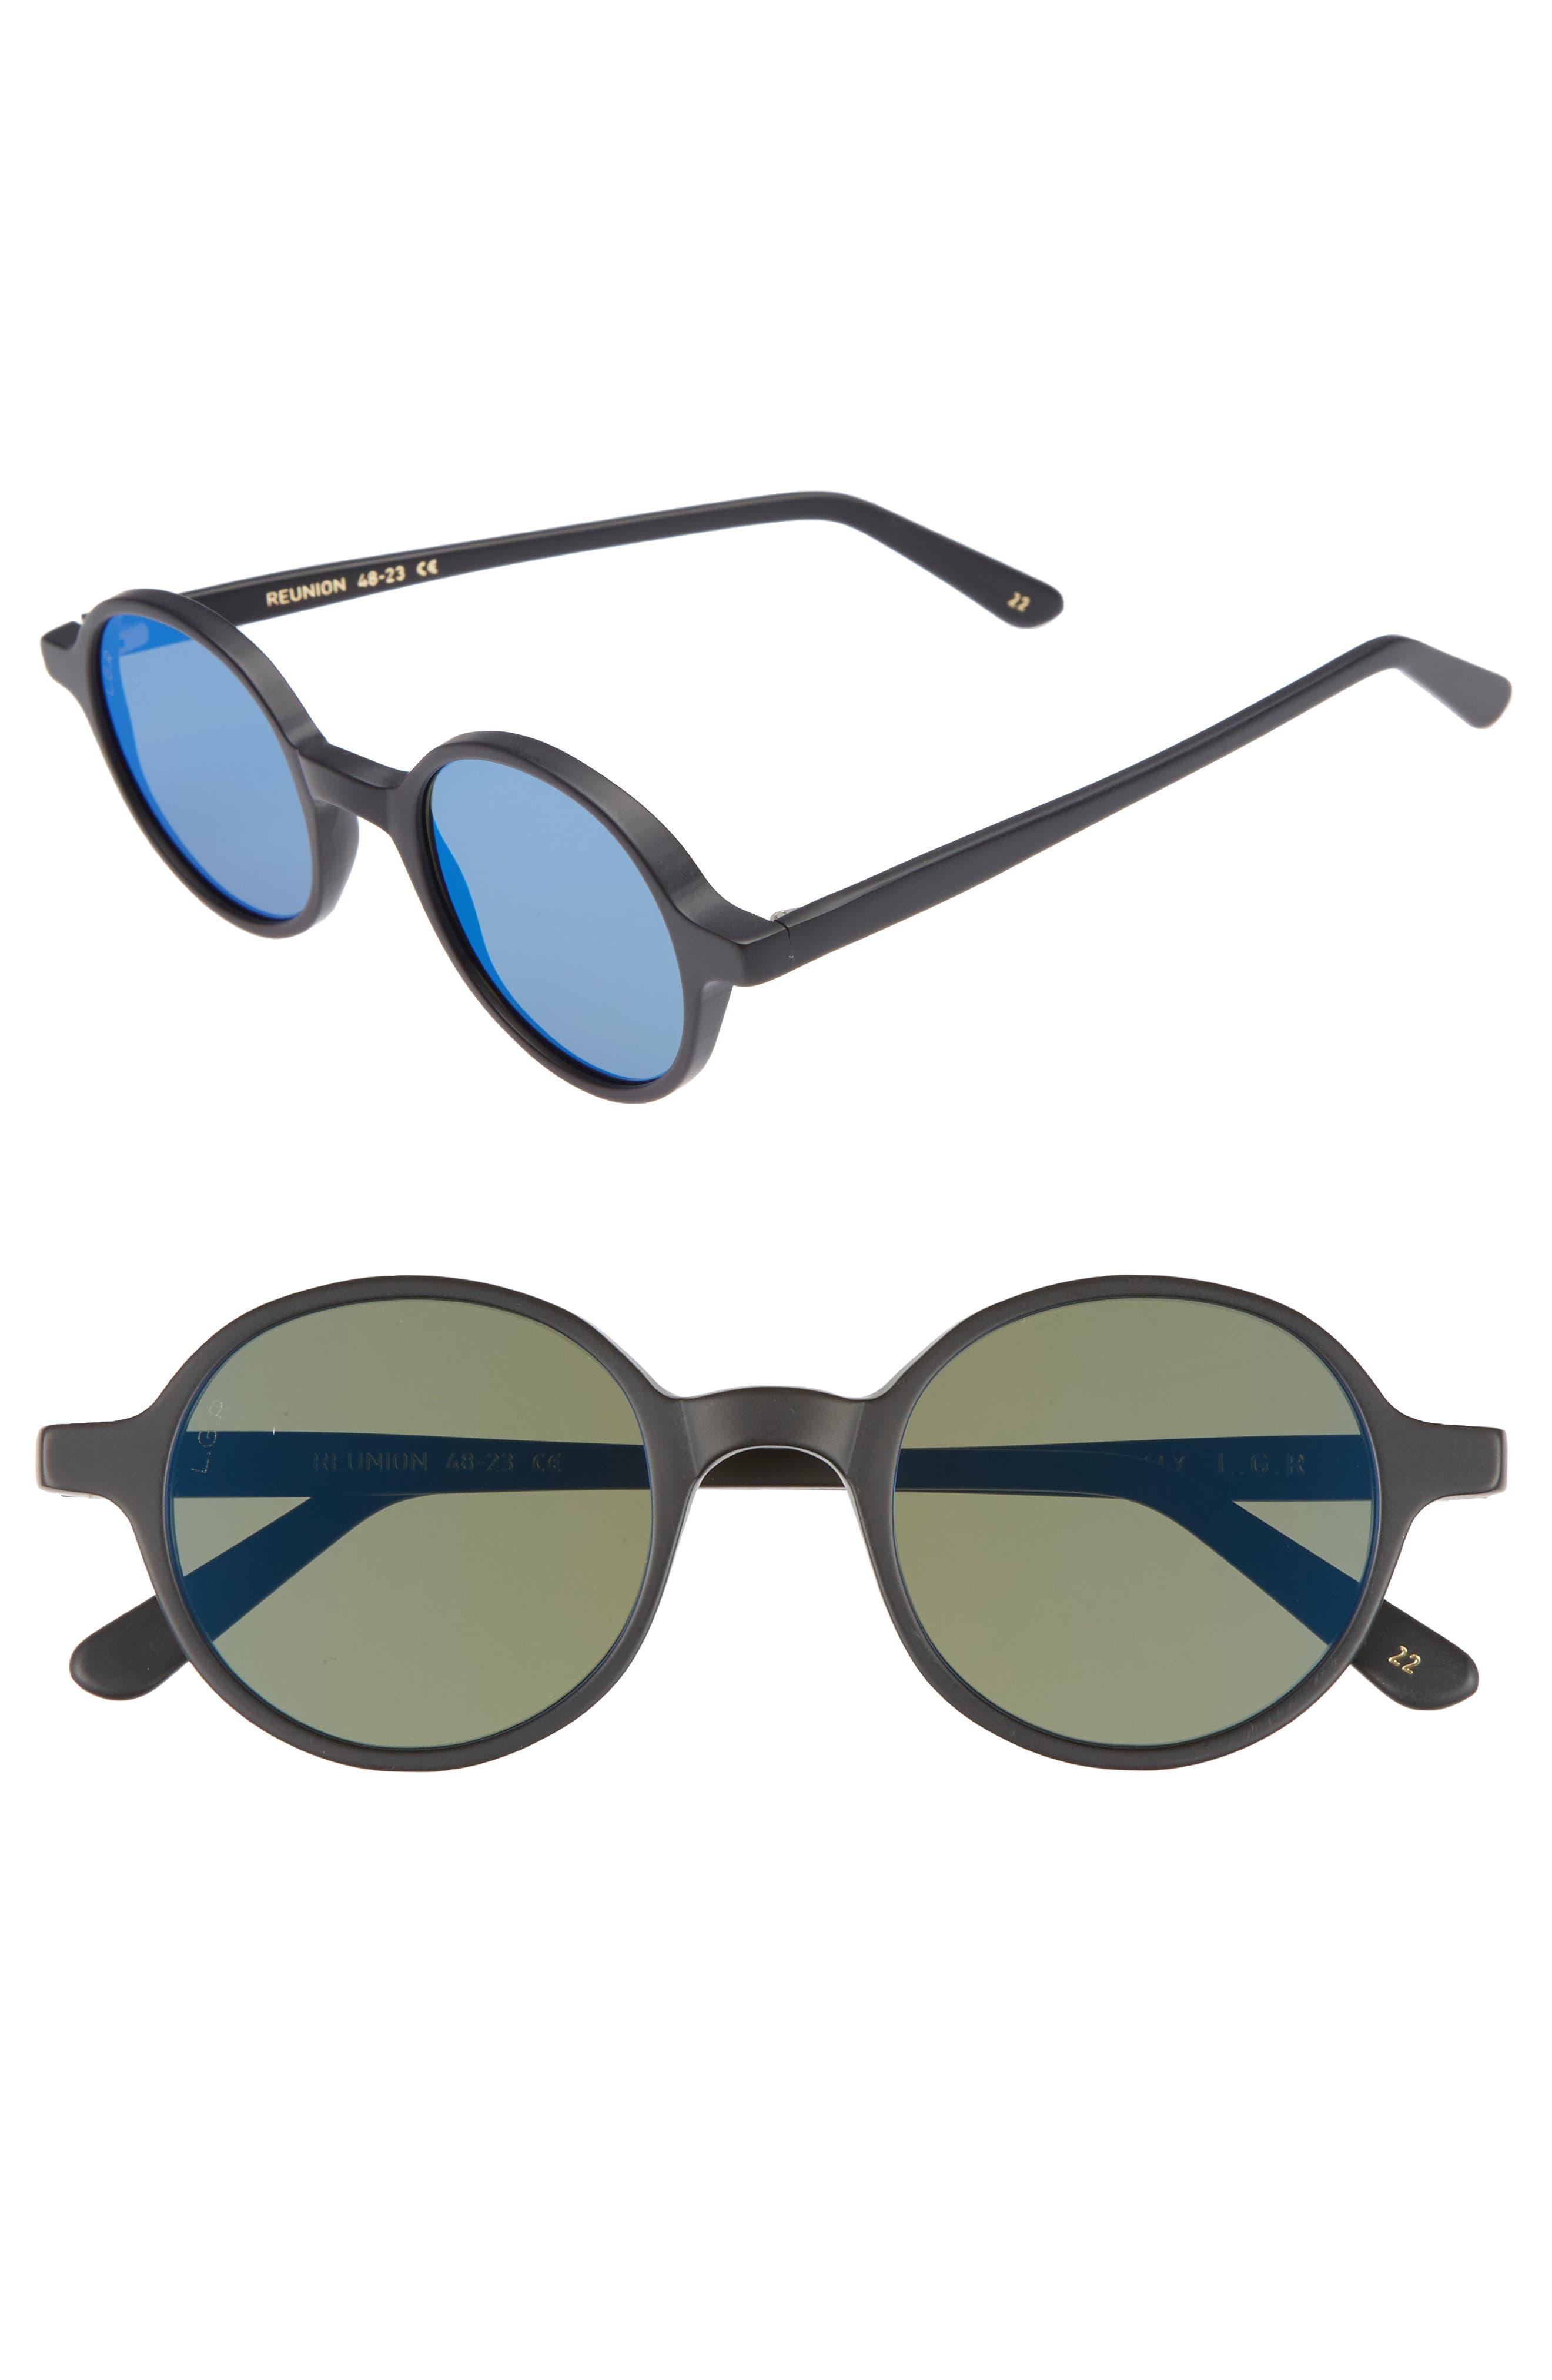 Alternate Image 1 Selected - L.G.R Reunion 48mm Sunglasses